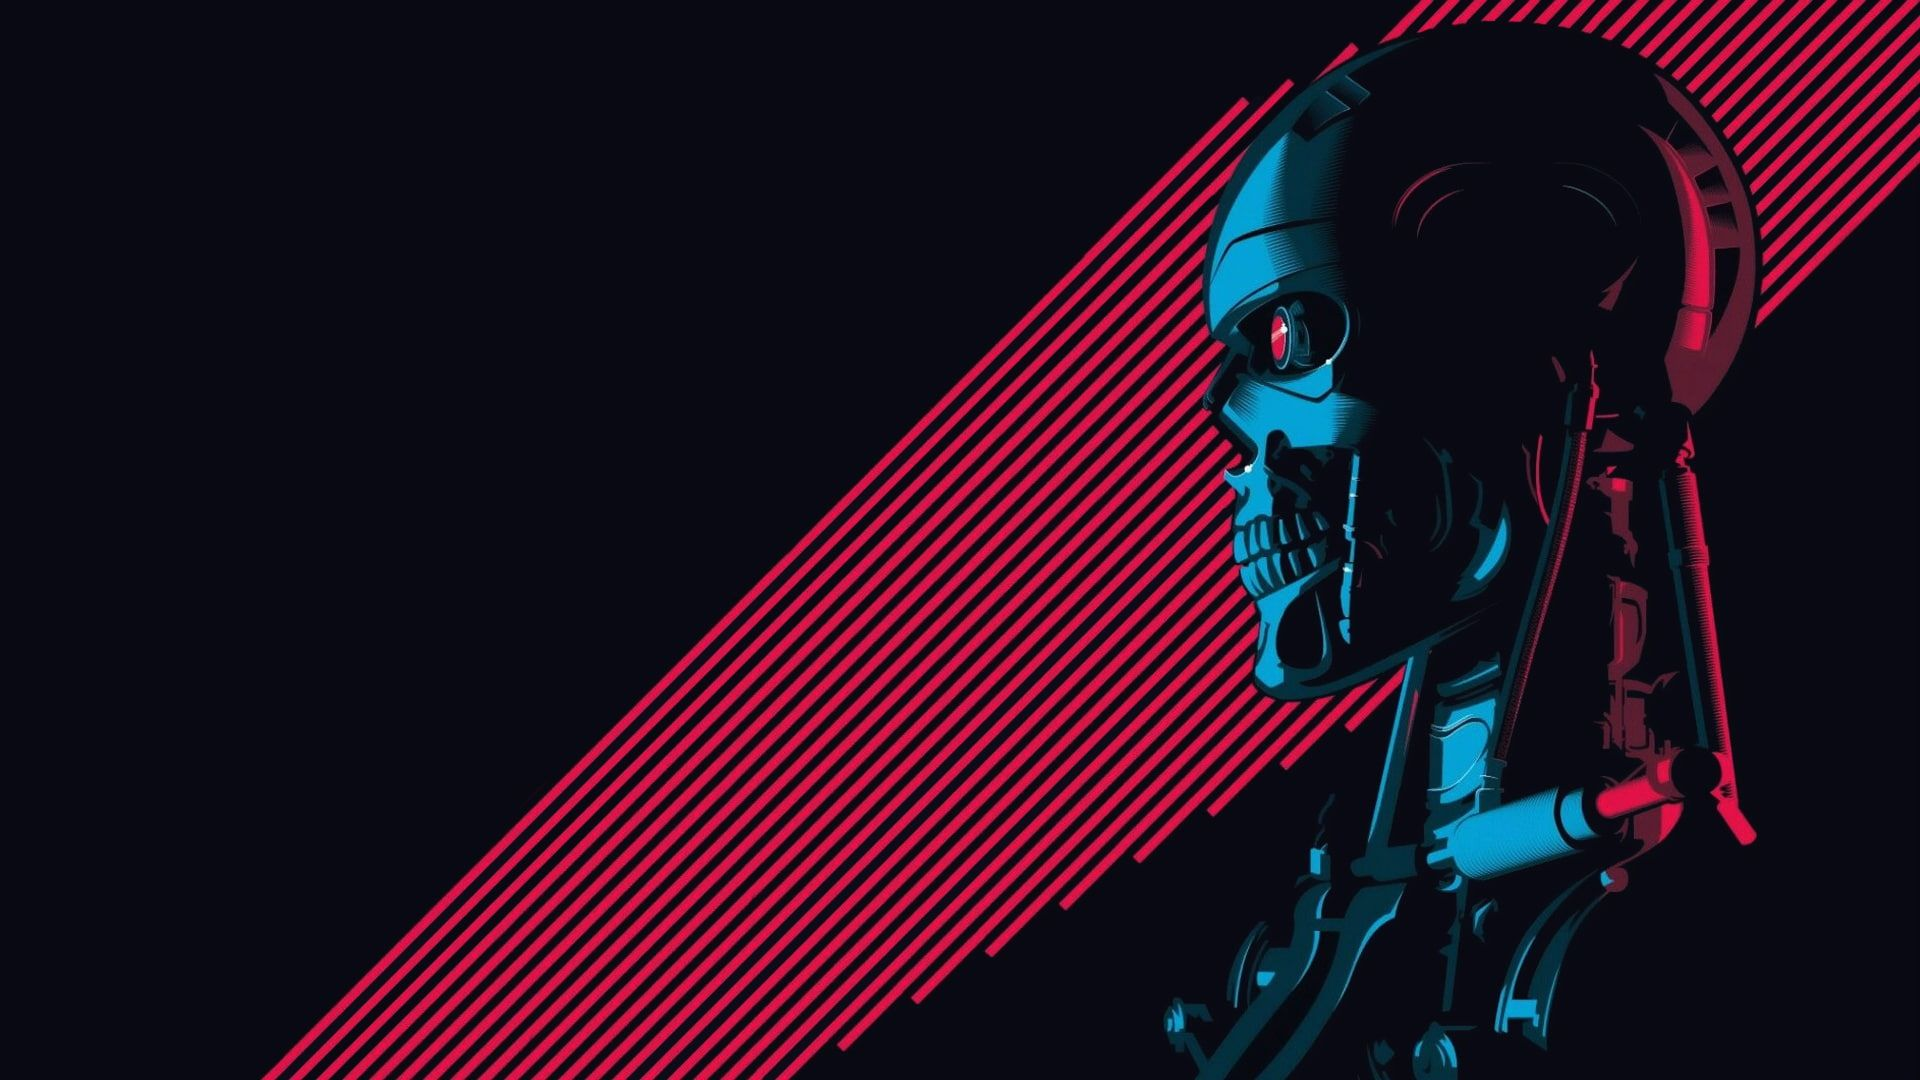 HD wallpaper: Minimalism, Figure, Background, Art, Robot, Terminator, T-800